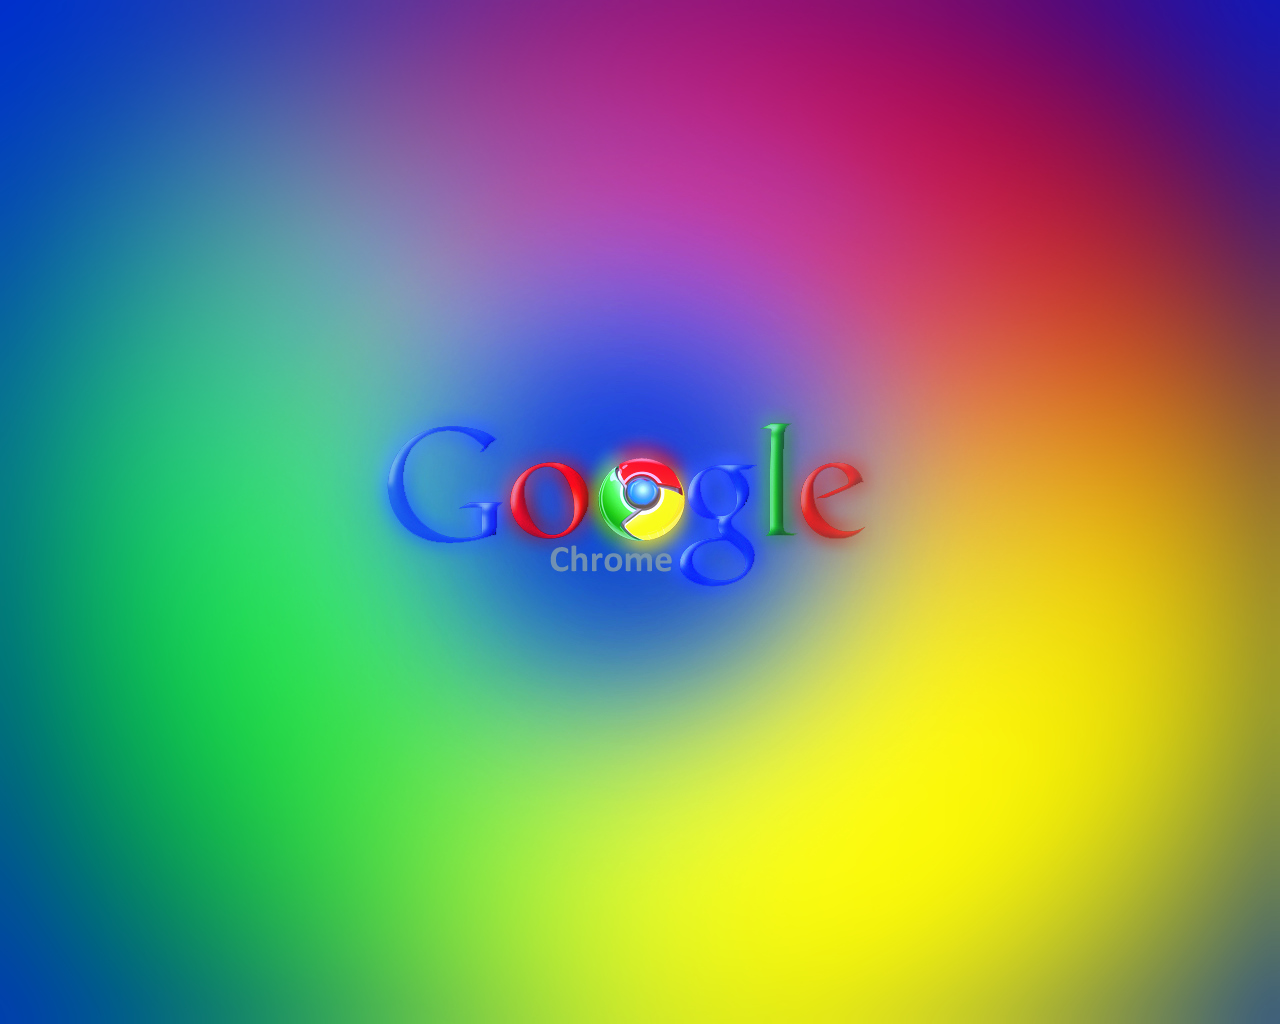 Google themes on safari - Wallpaper Google Themes Free Download Google Chrome Wallpapers Free